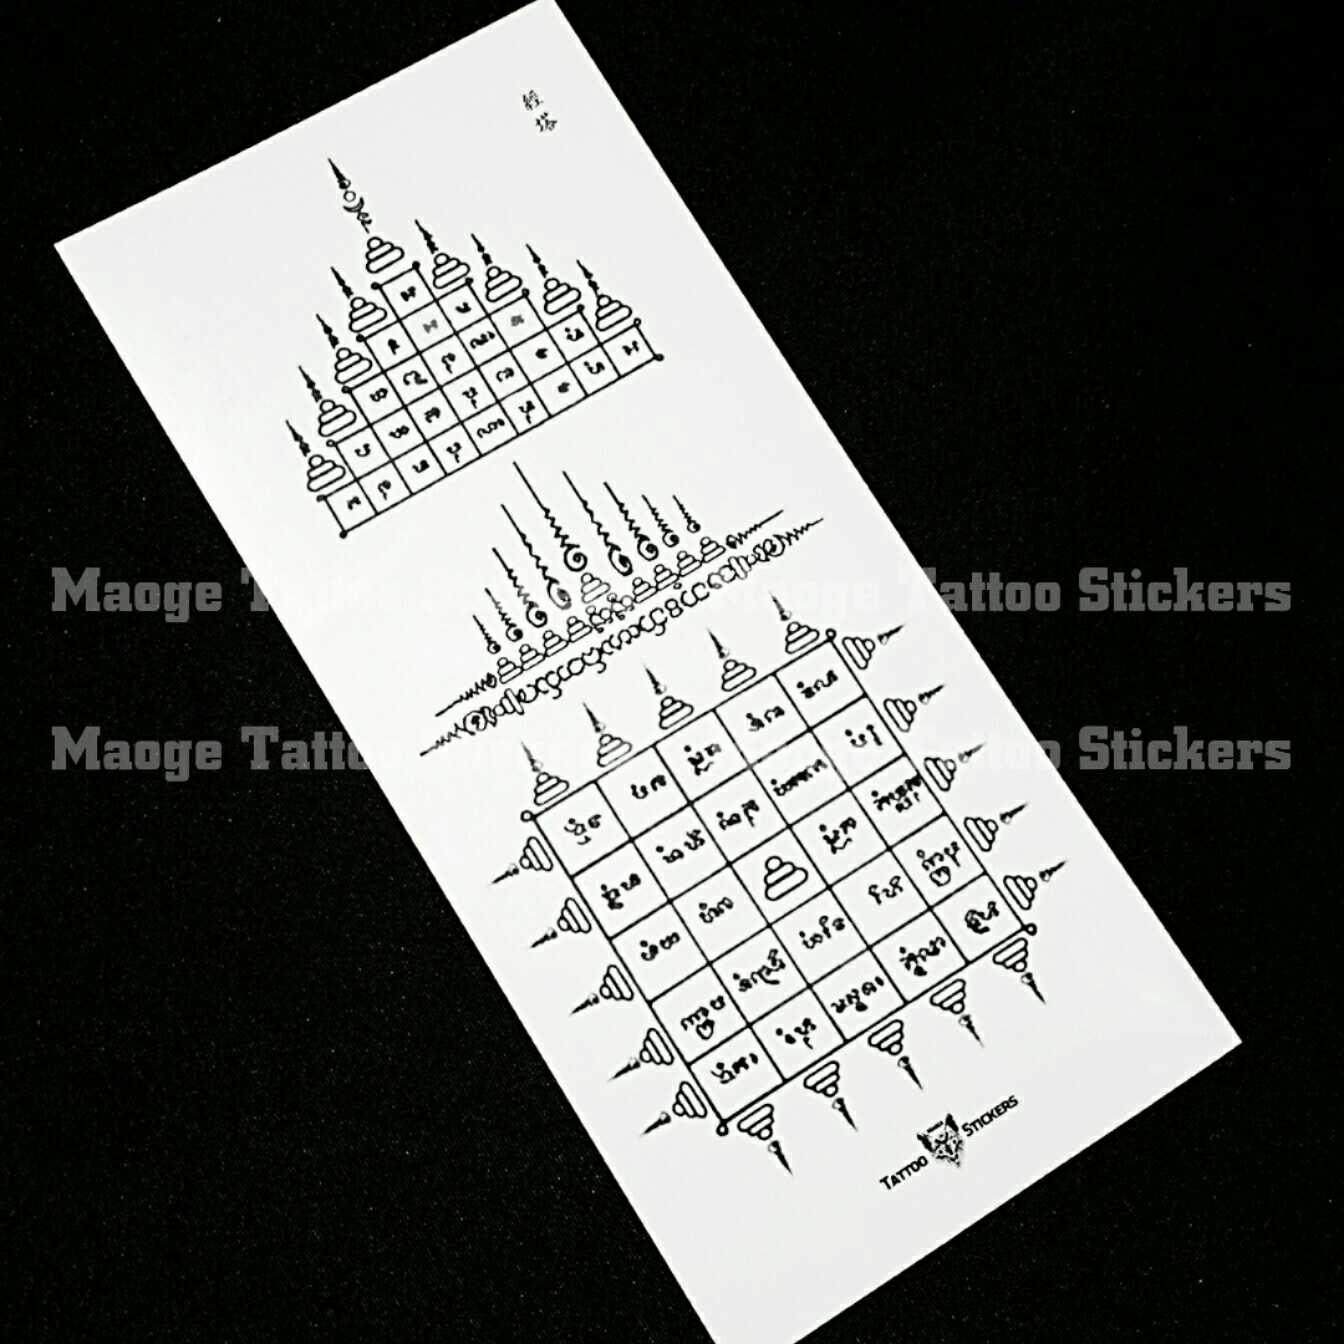 mg纹身贴-/幸运纹身/泰国刺符/经文经塔刺符纹身图案贴纸防水防汗图片